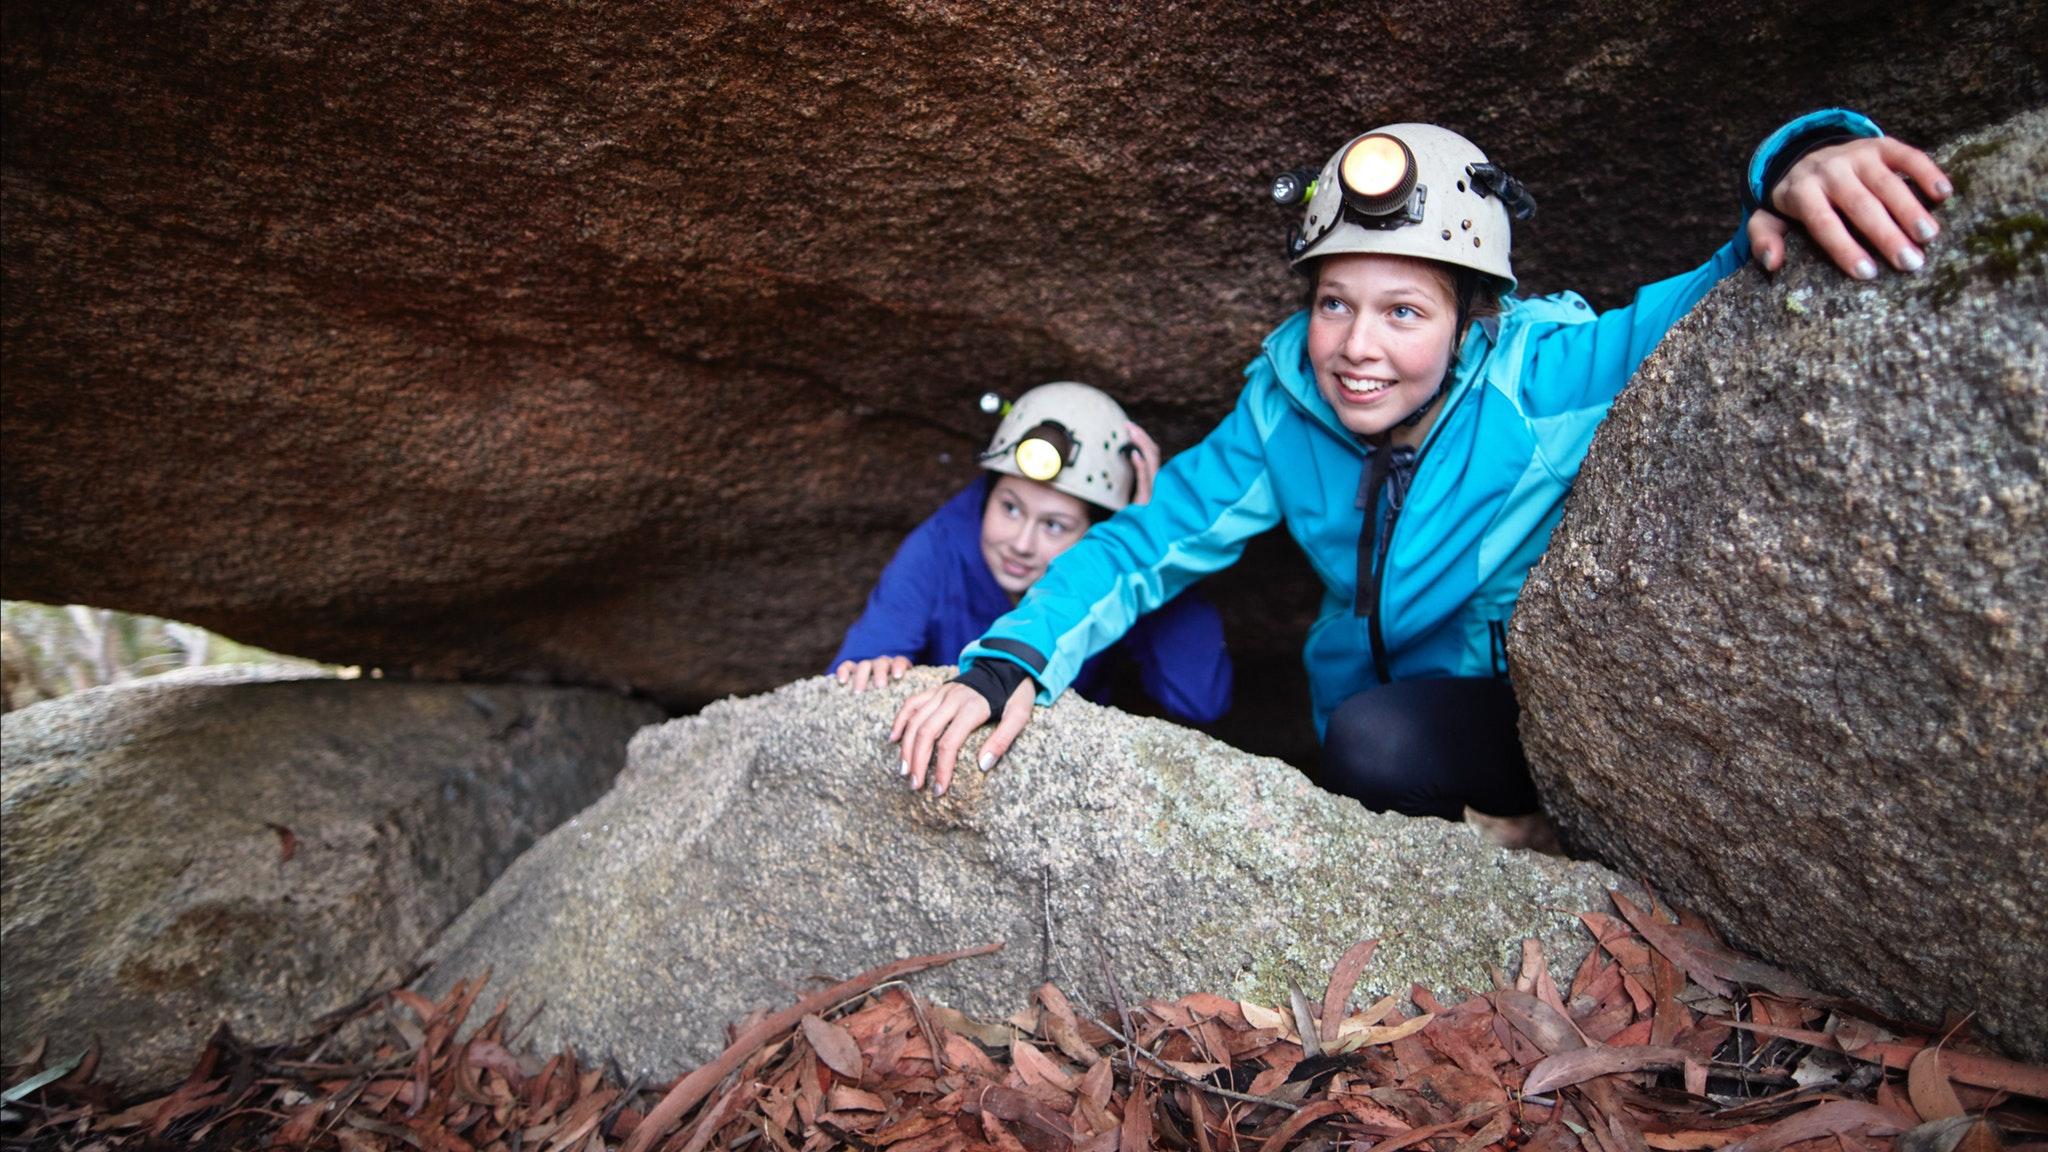 Underground River Caving at Mount Buffalo